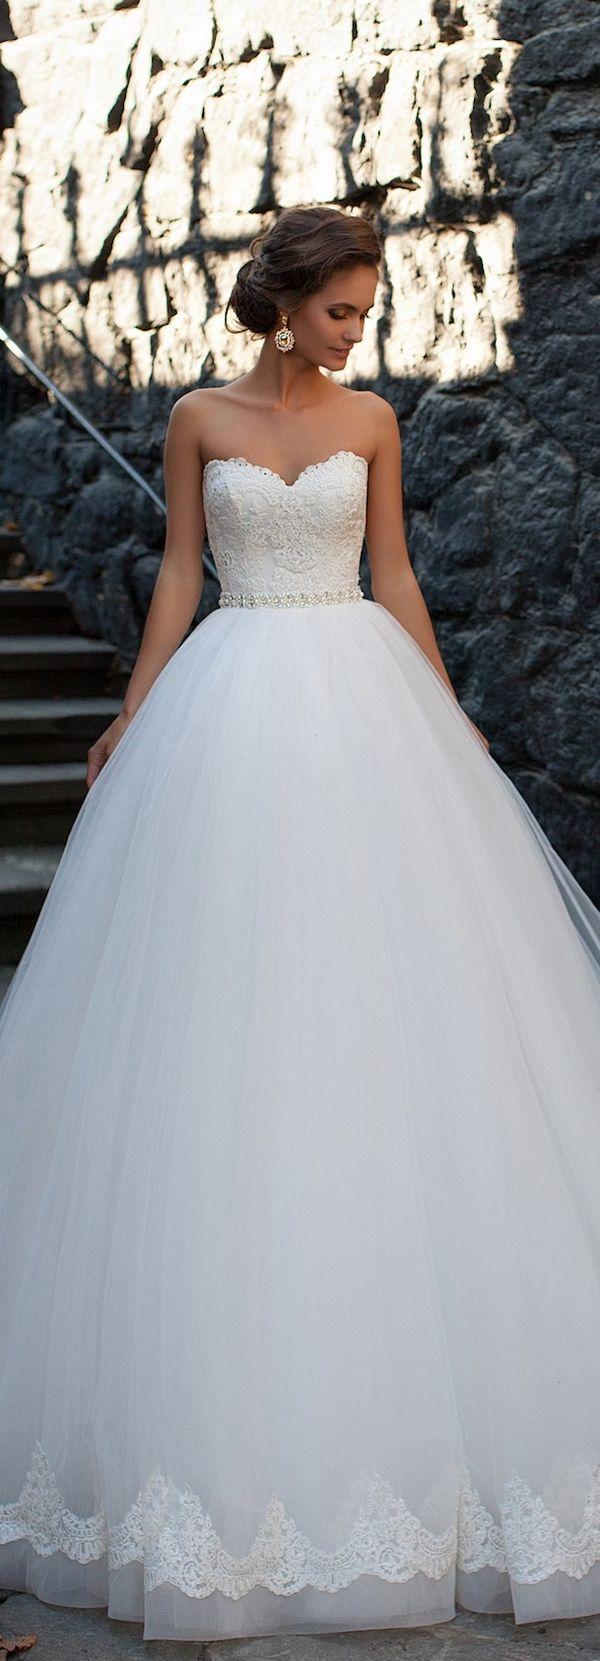 The Most Hottest Milla Nova 2016 Wedding Dresses | Wedding dress ...